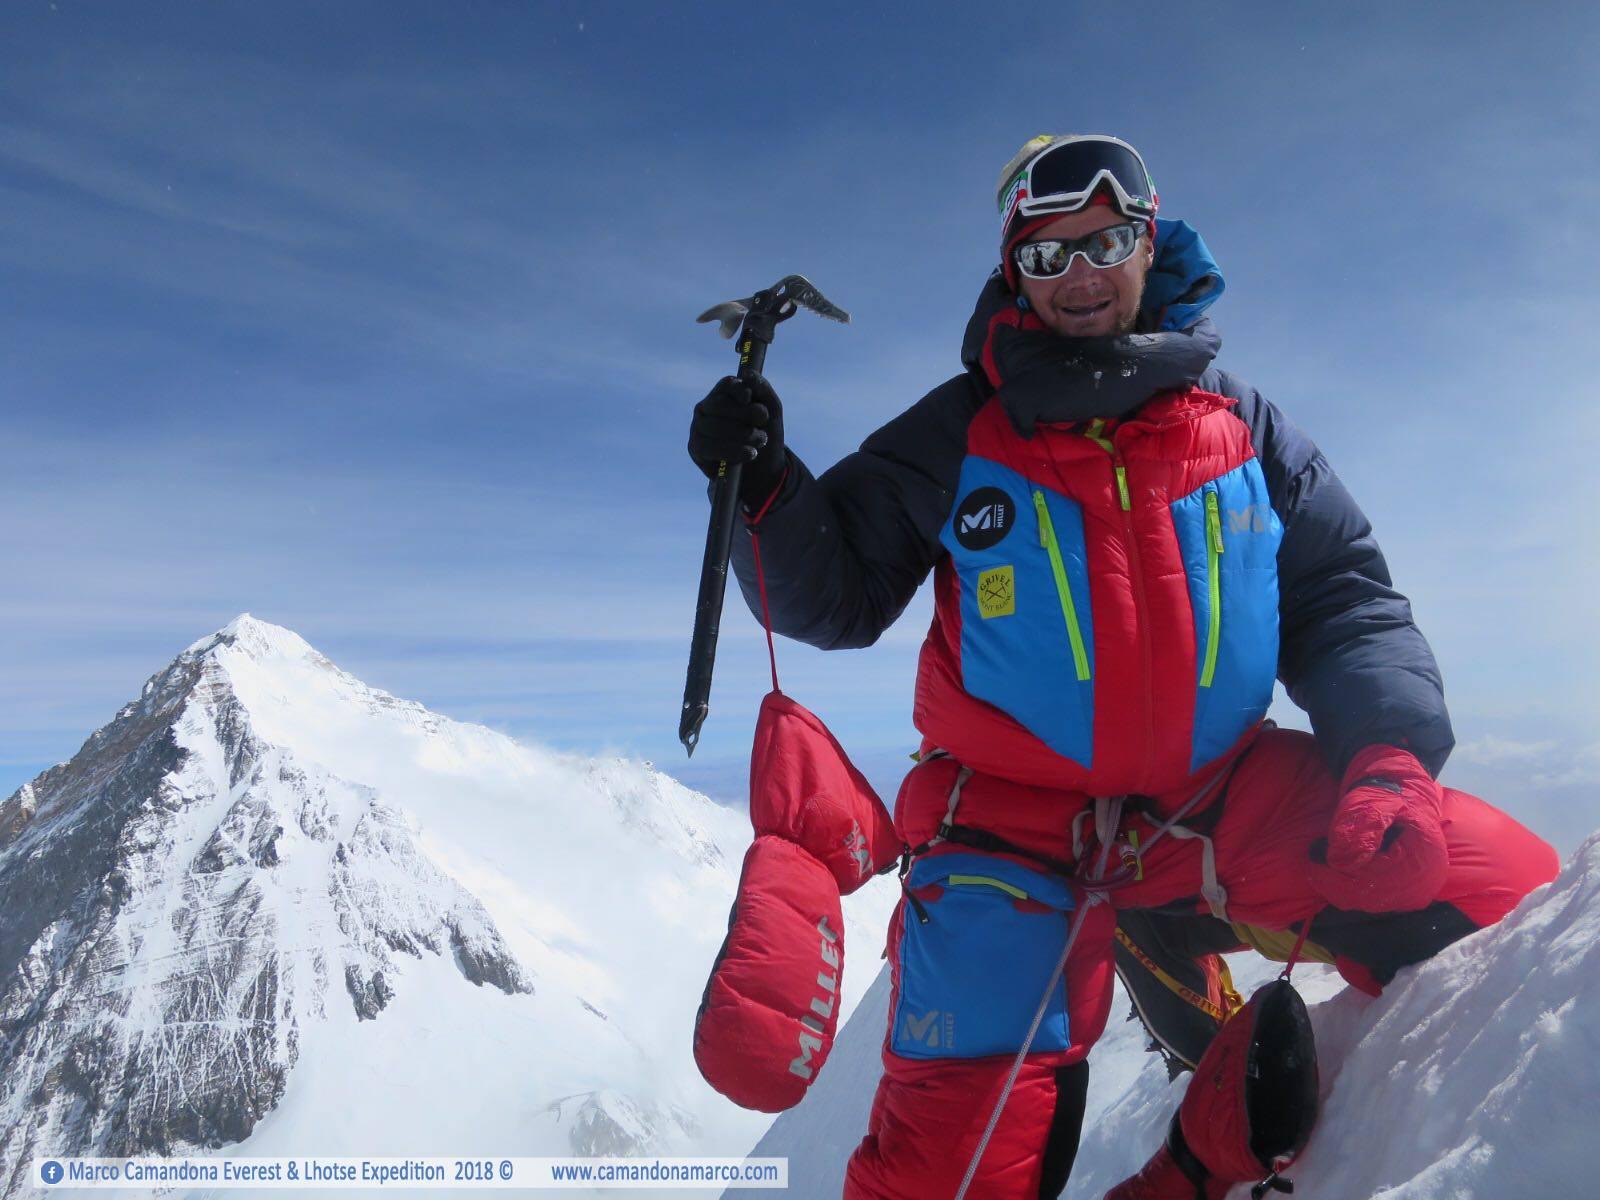 marco camandona, everest, lhotse, alpinismo, himalaya